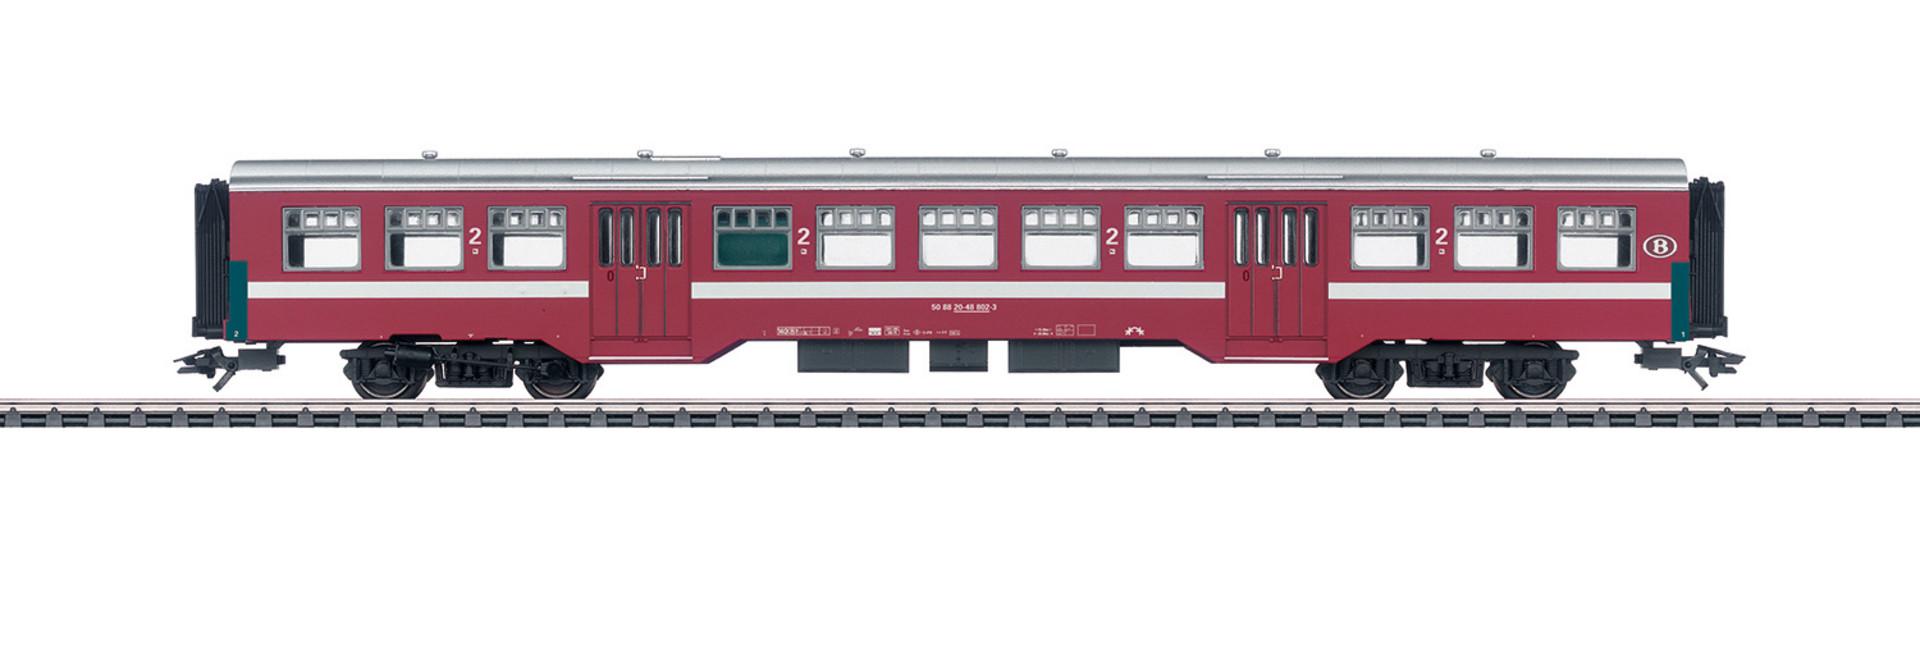 43545-01 Buurtverkeersrijtuig M2 1/2 klasse